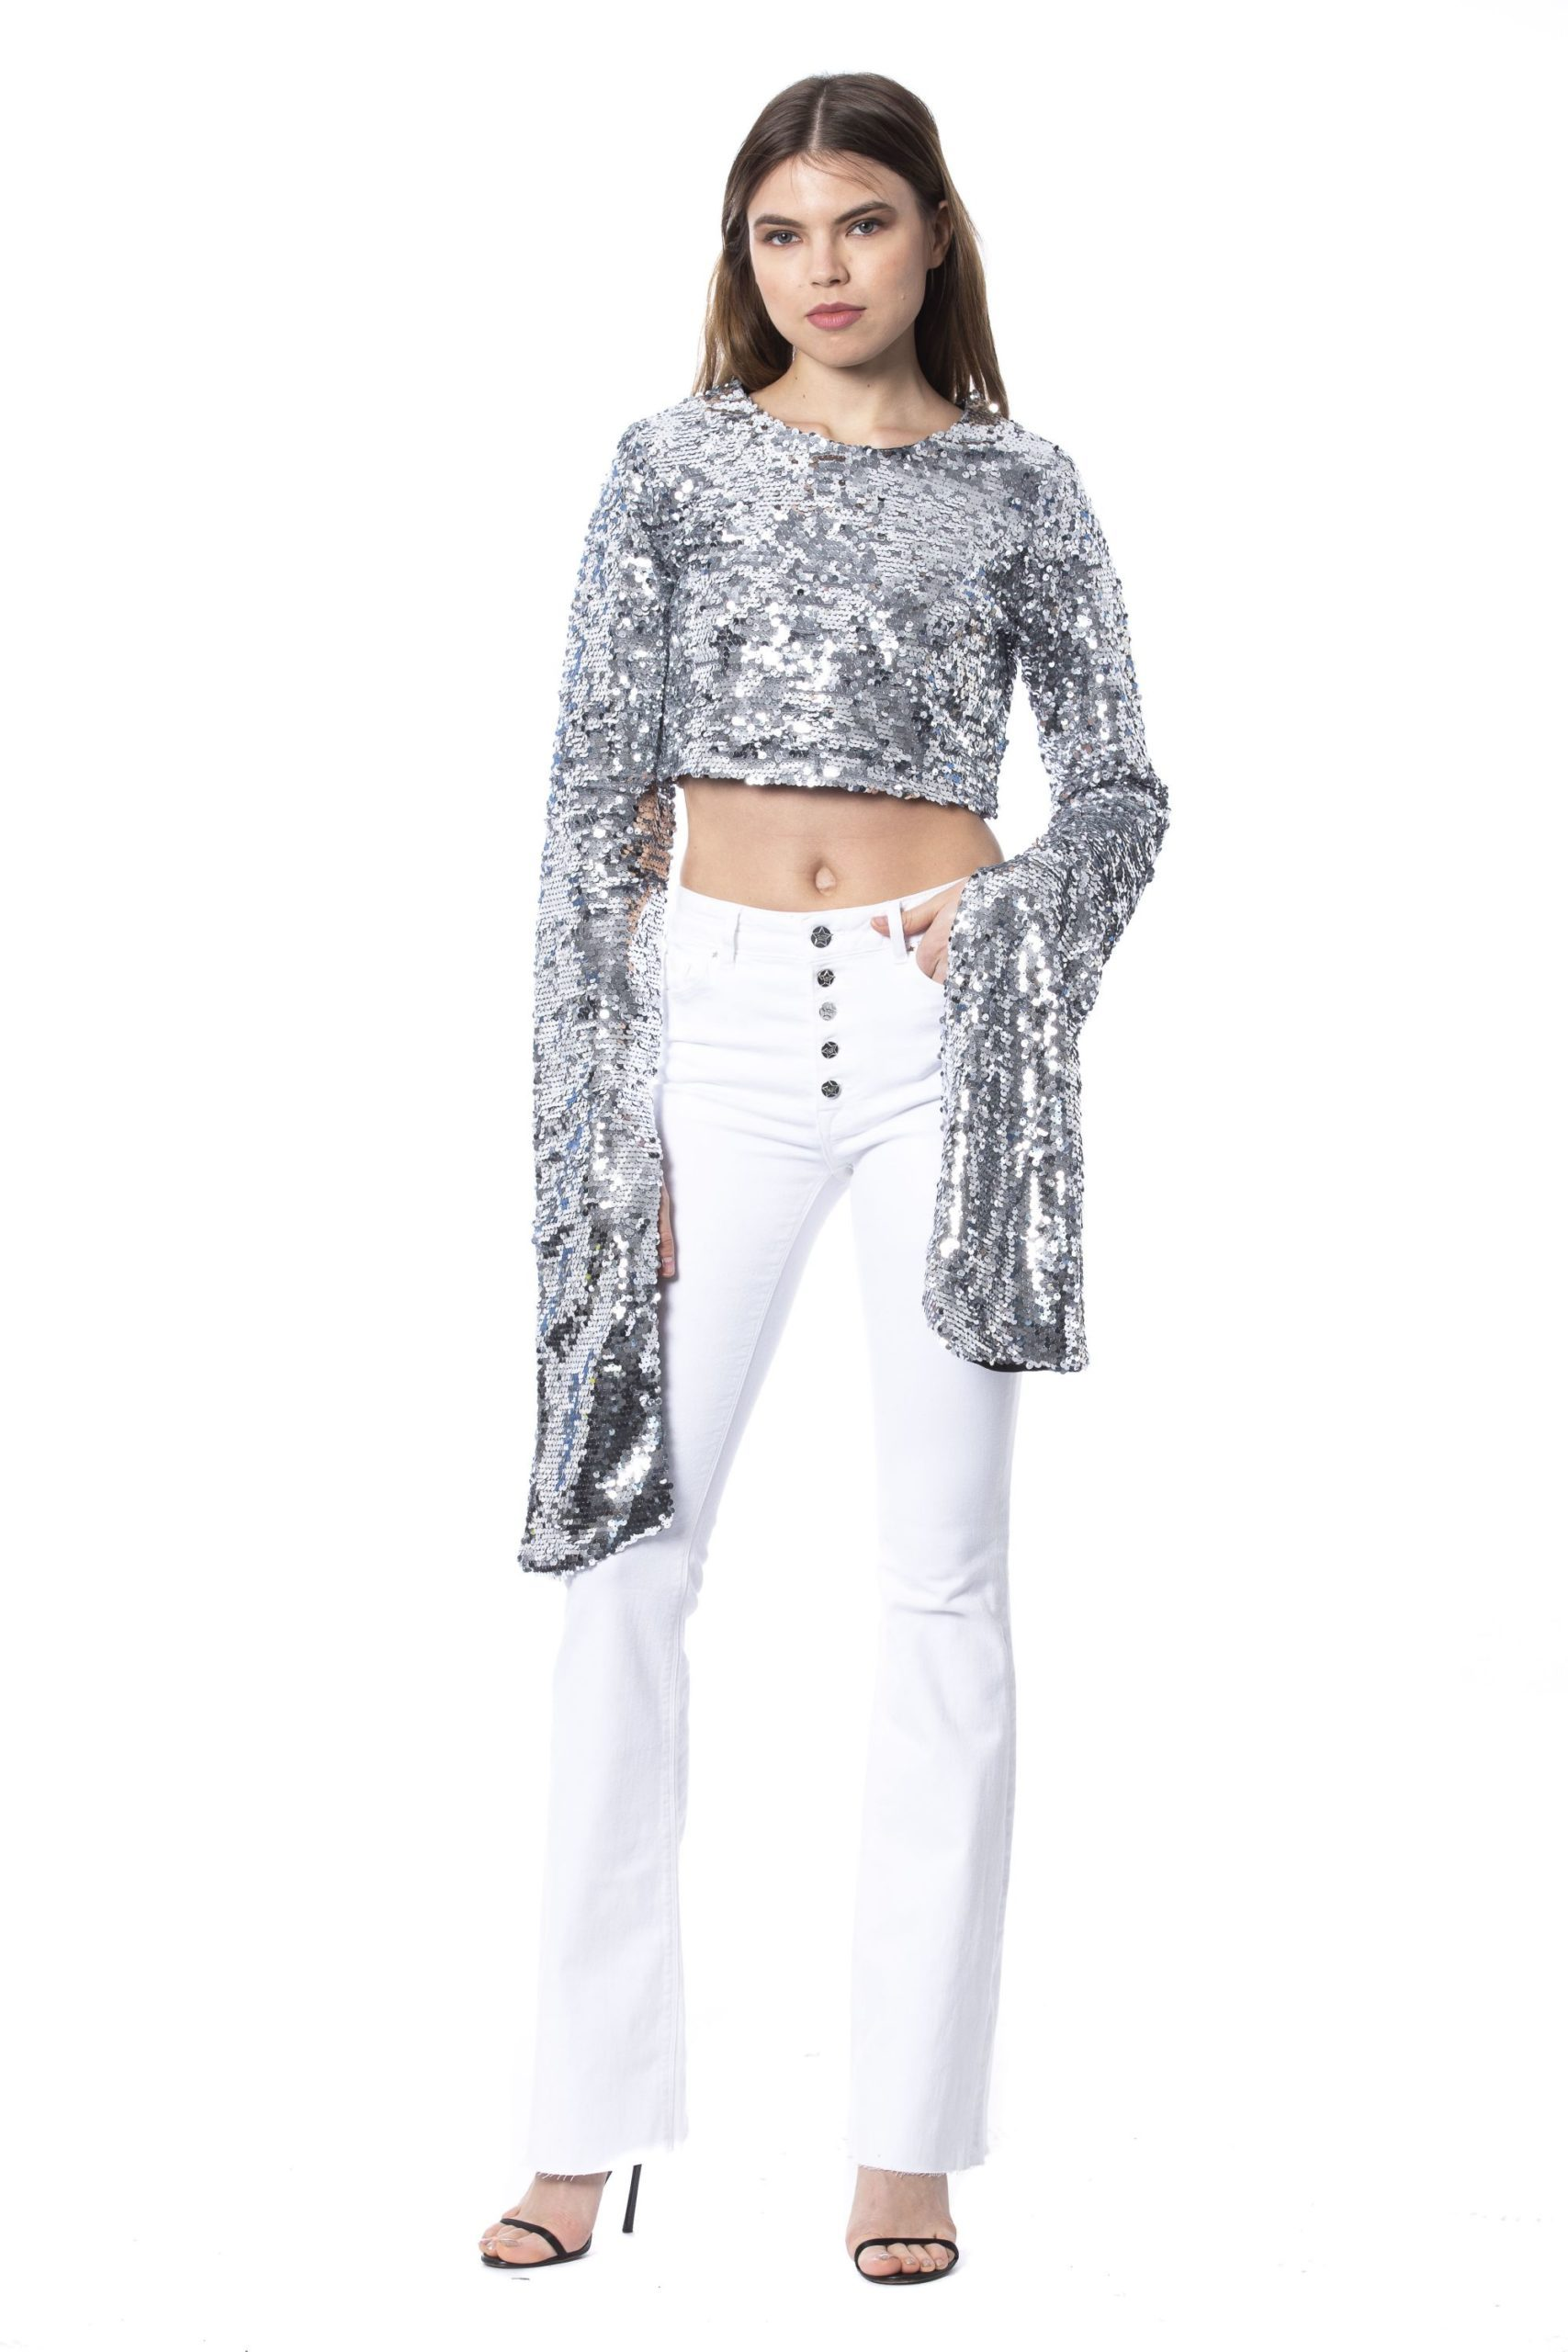 Silvian Heach Women's Sweater SI992762 - XS